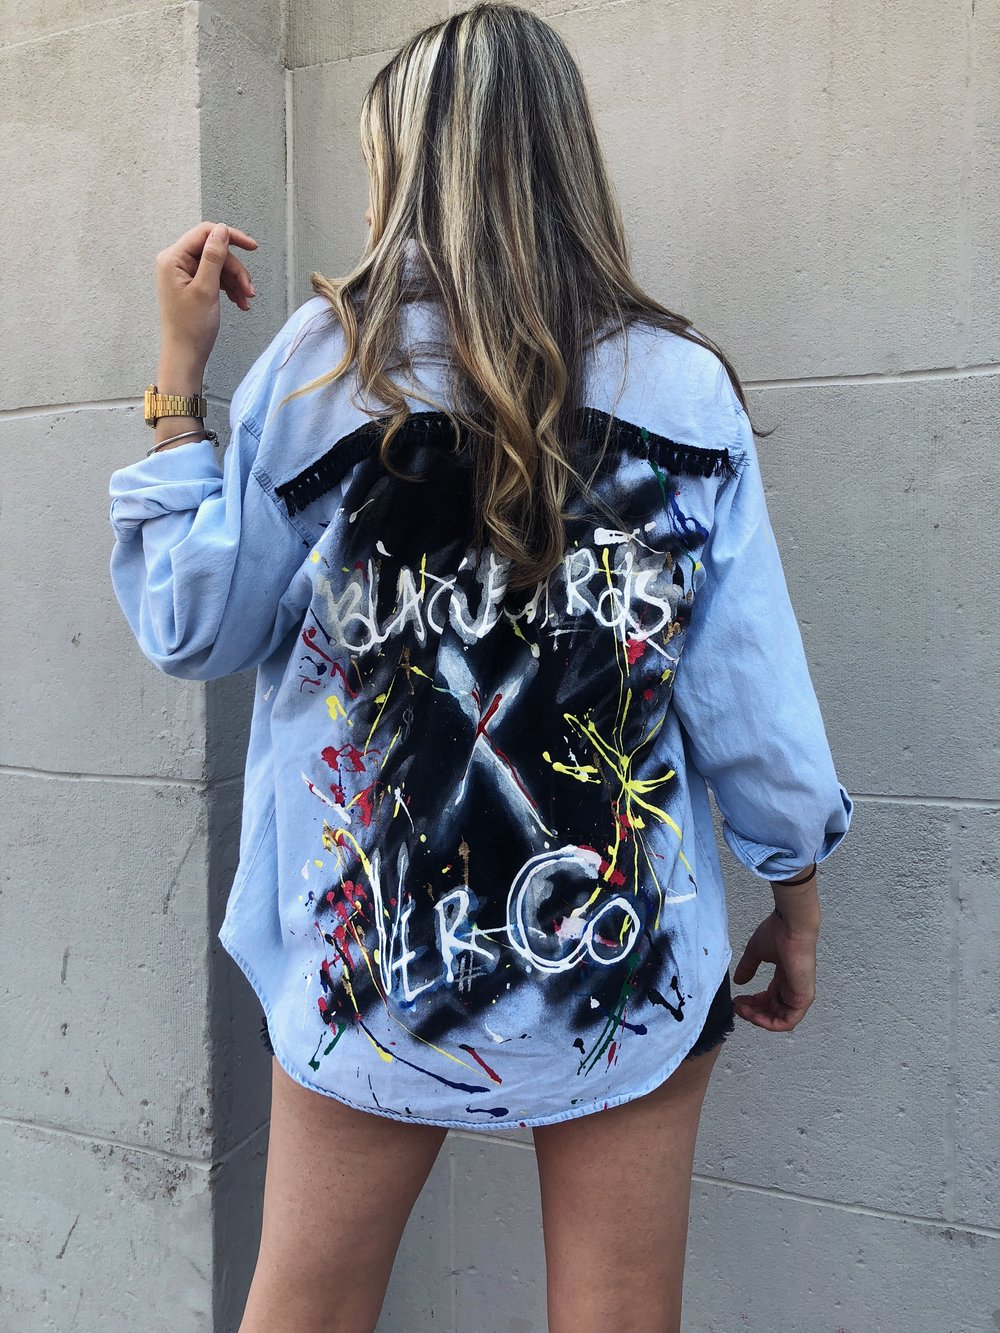 Ana in the Blackboards x Ver Co soft denim shirt.